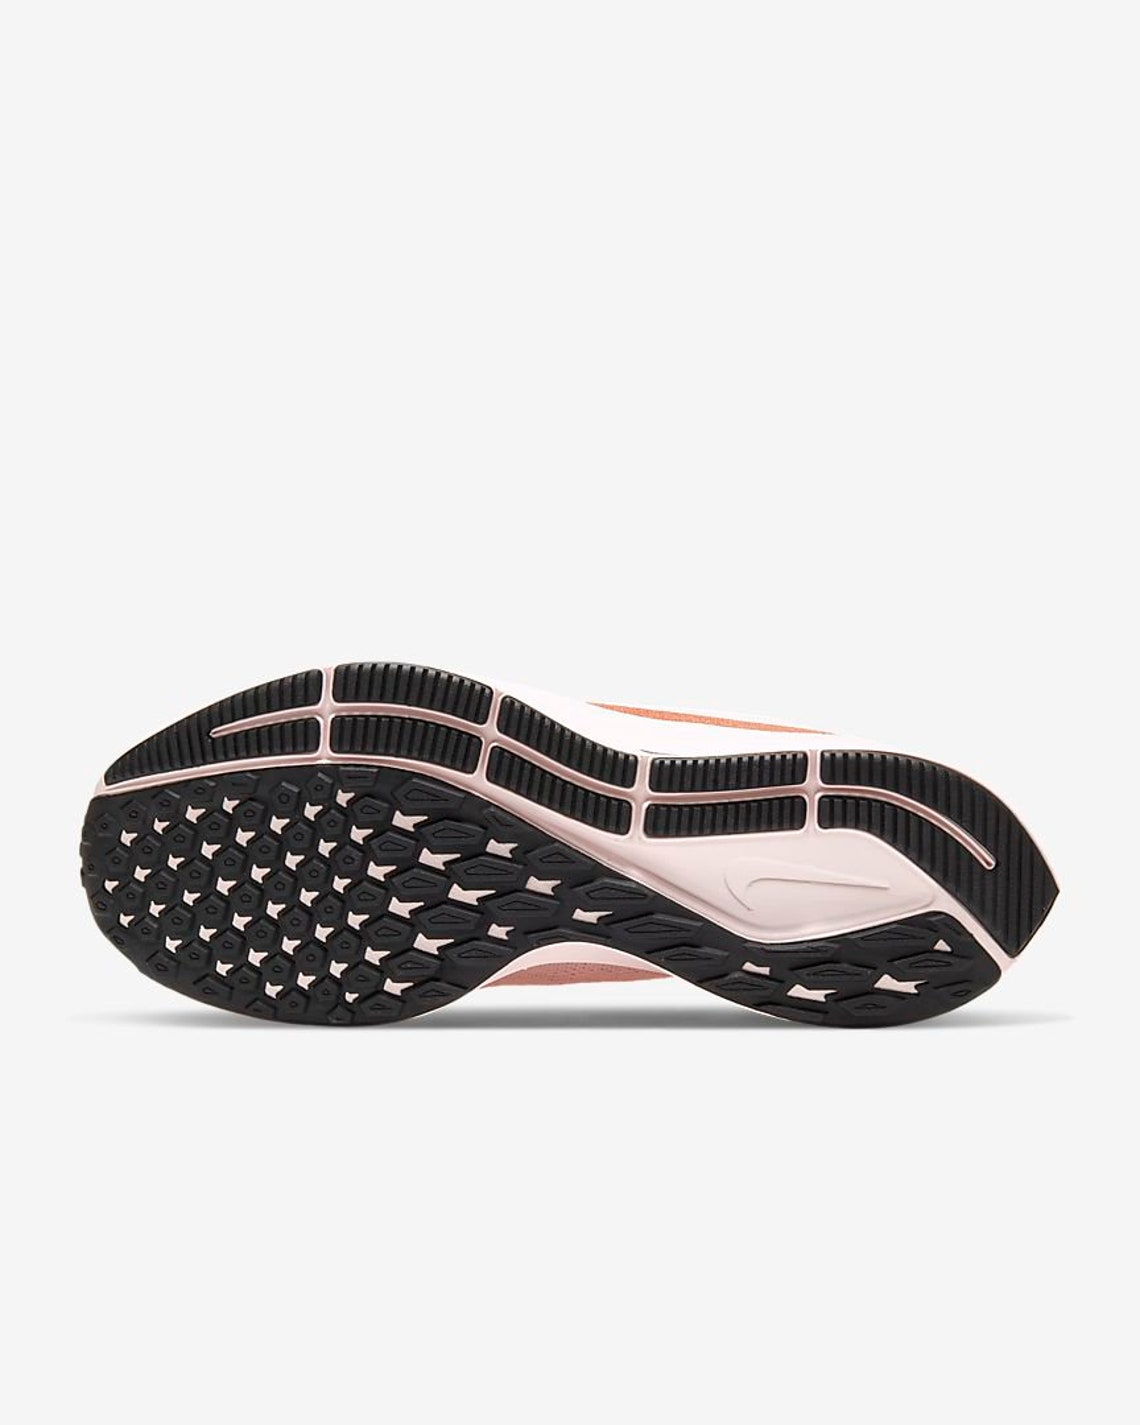 Swarovski Nike Air Zoom Pegasus 36 zapatillas rosas personalizadas con swarovski cristales Custom Bling Nike zapatos